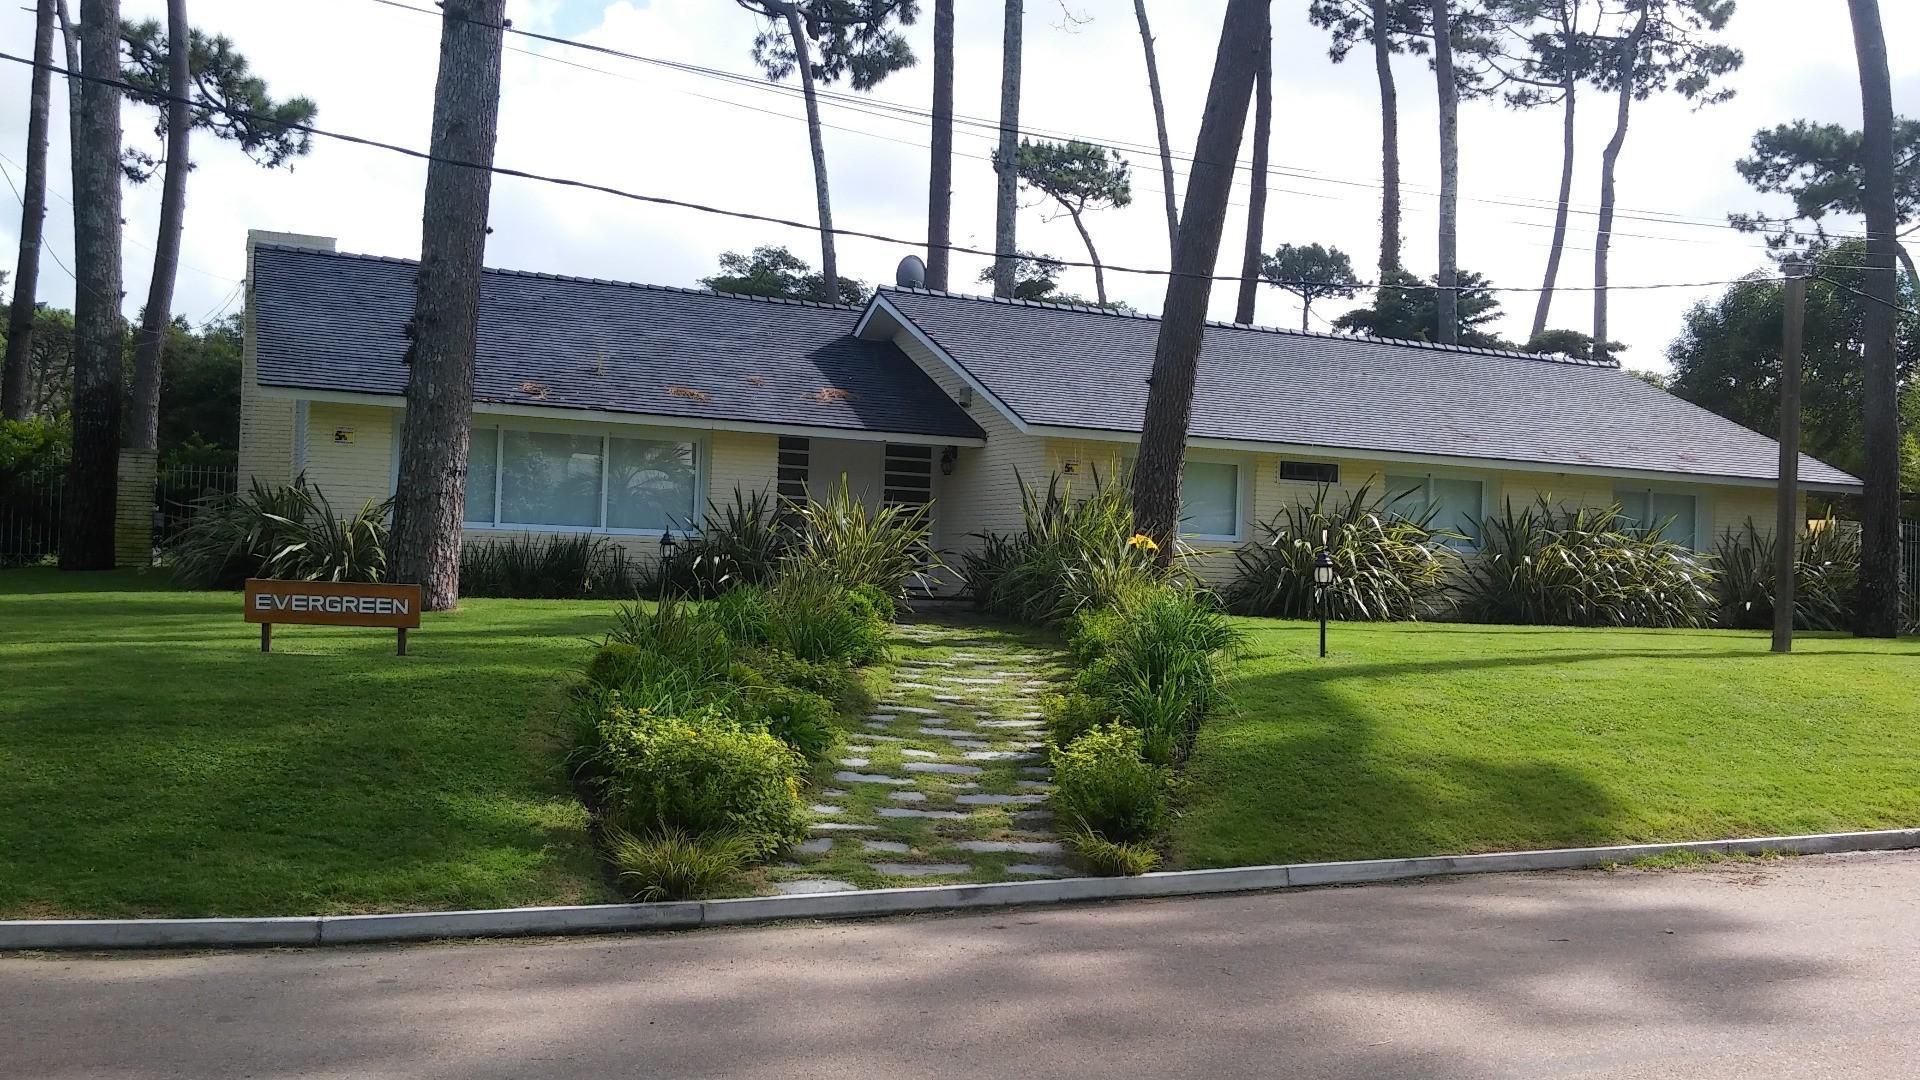 Espectacular casa a 4 cuadras de Playa Mansa